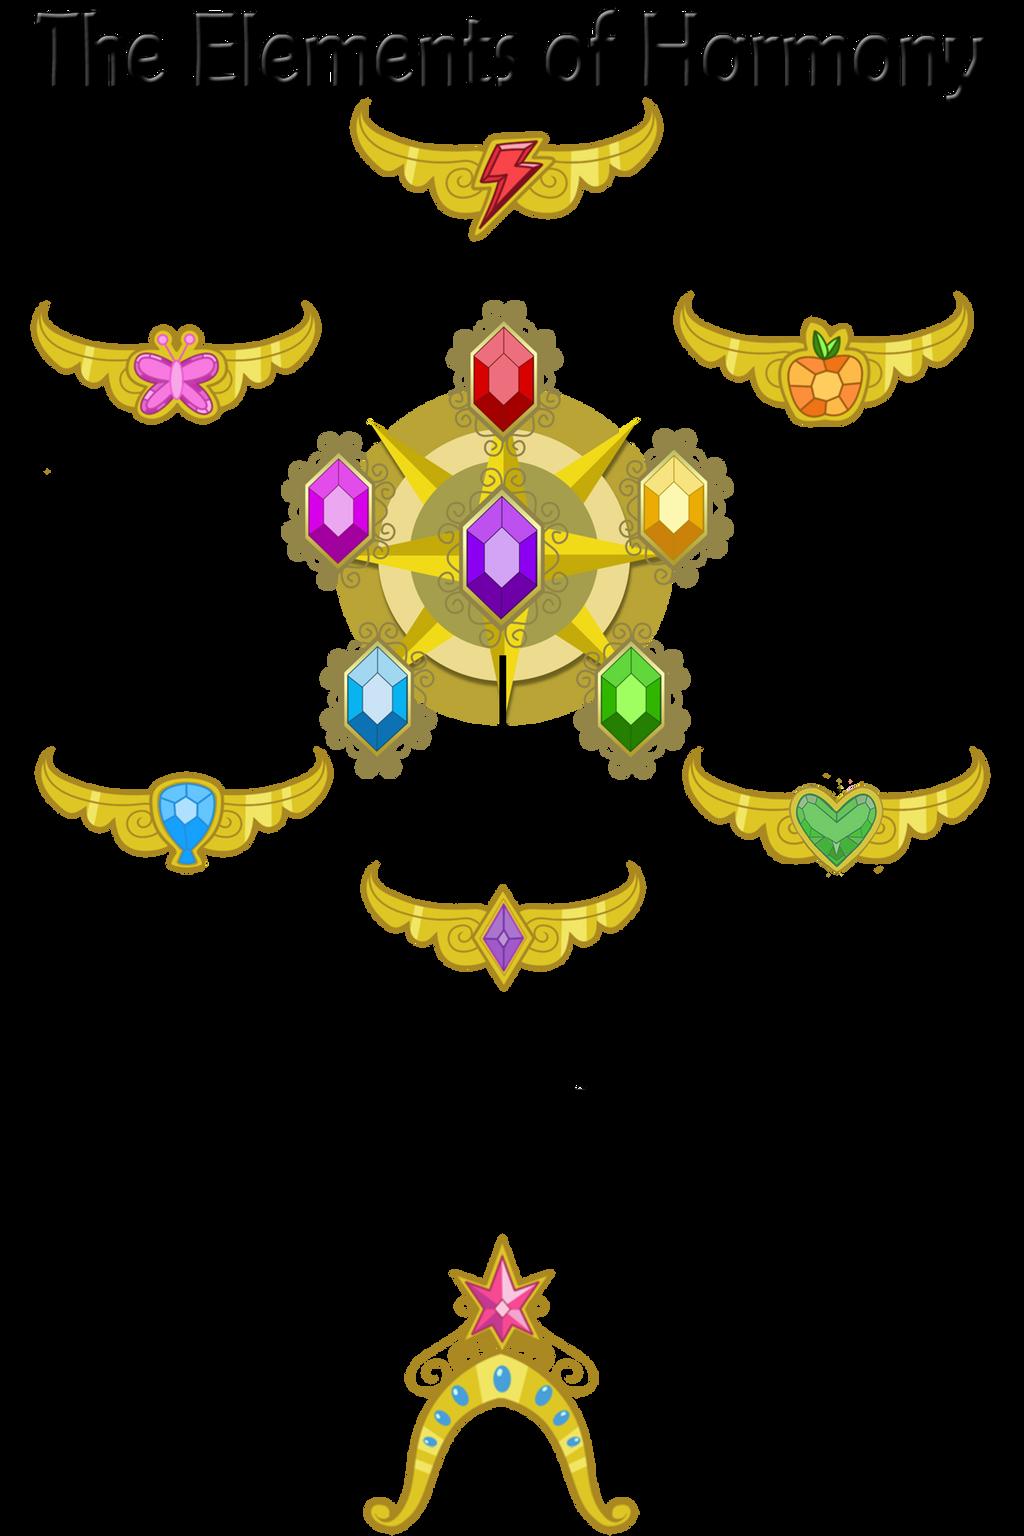 The Elements of Harmony by MysteryMelt on DeviantArt